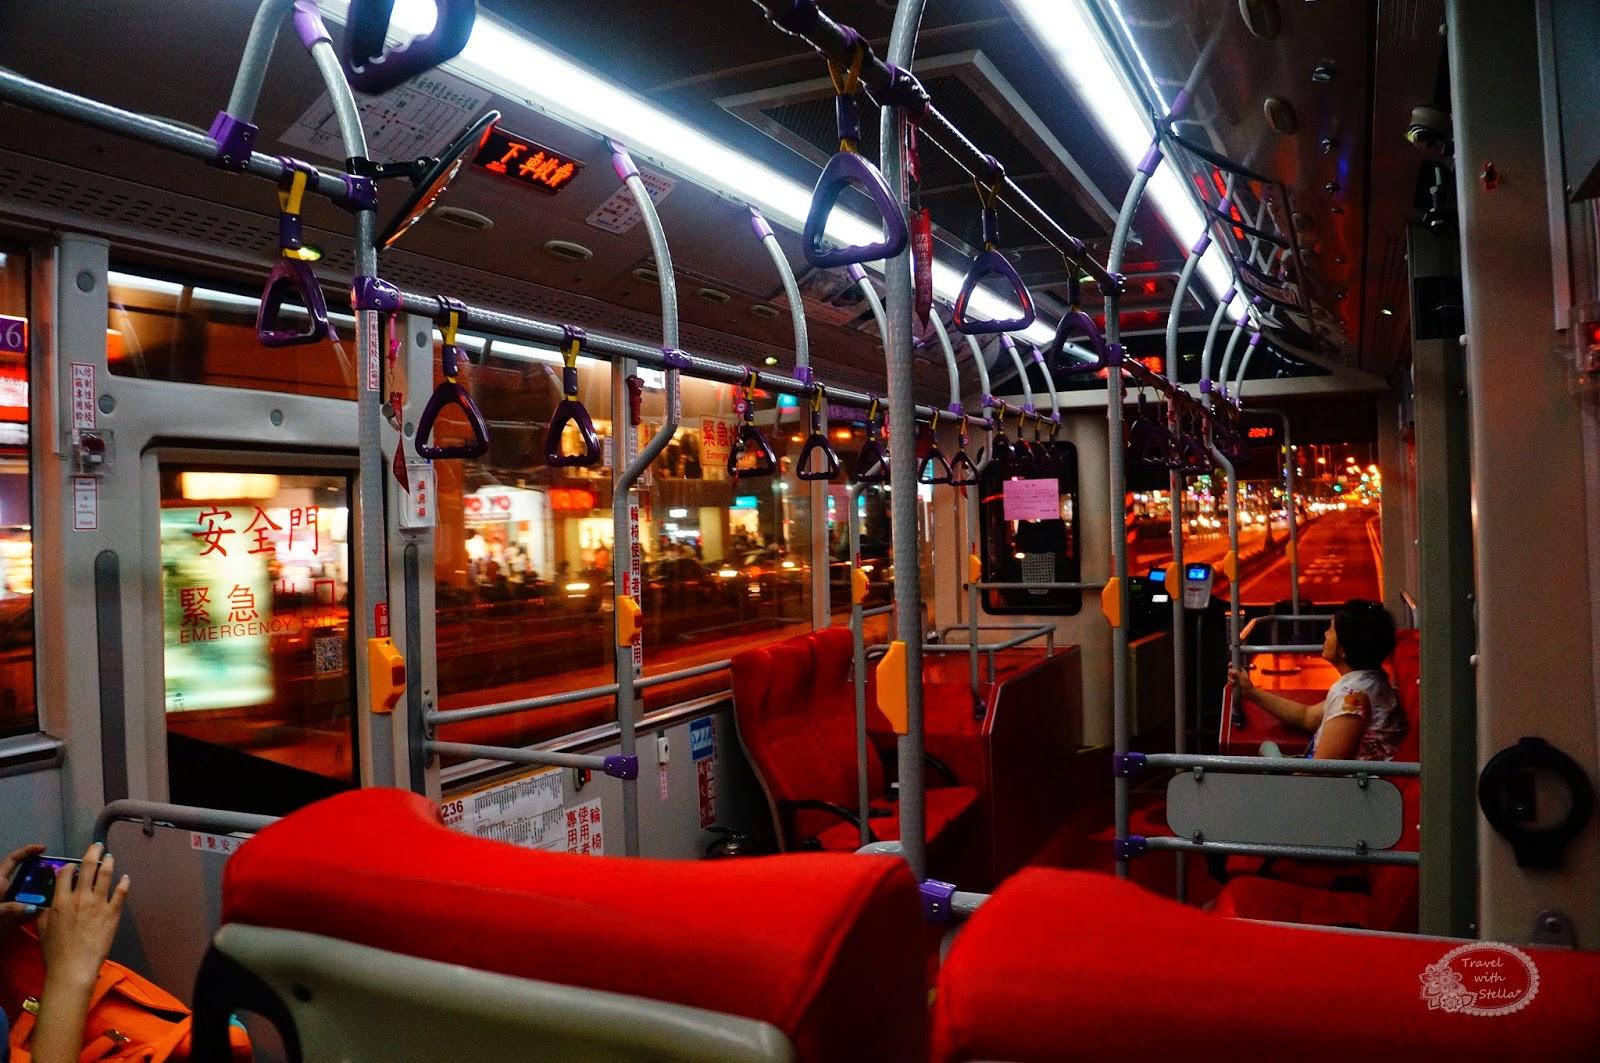 Travel with Stella*: 【臺灣】實習生之小記事。公車